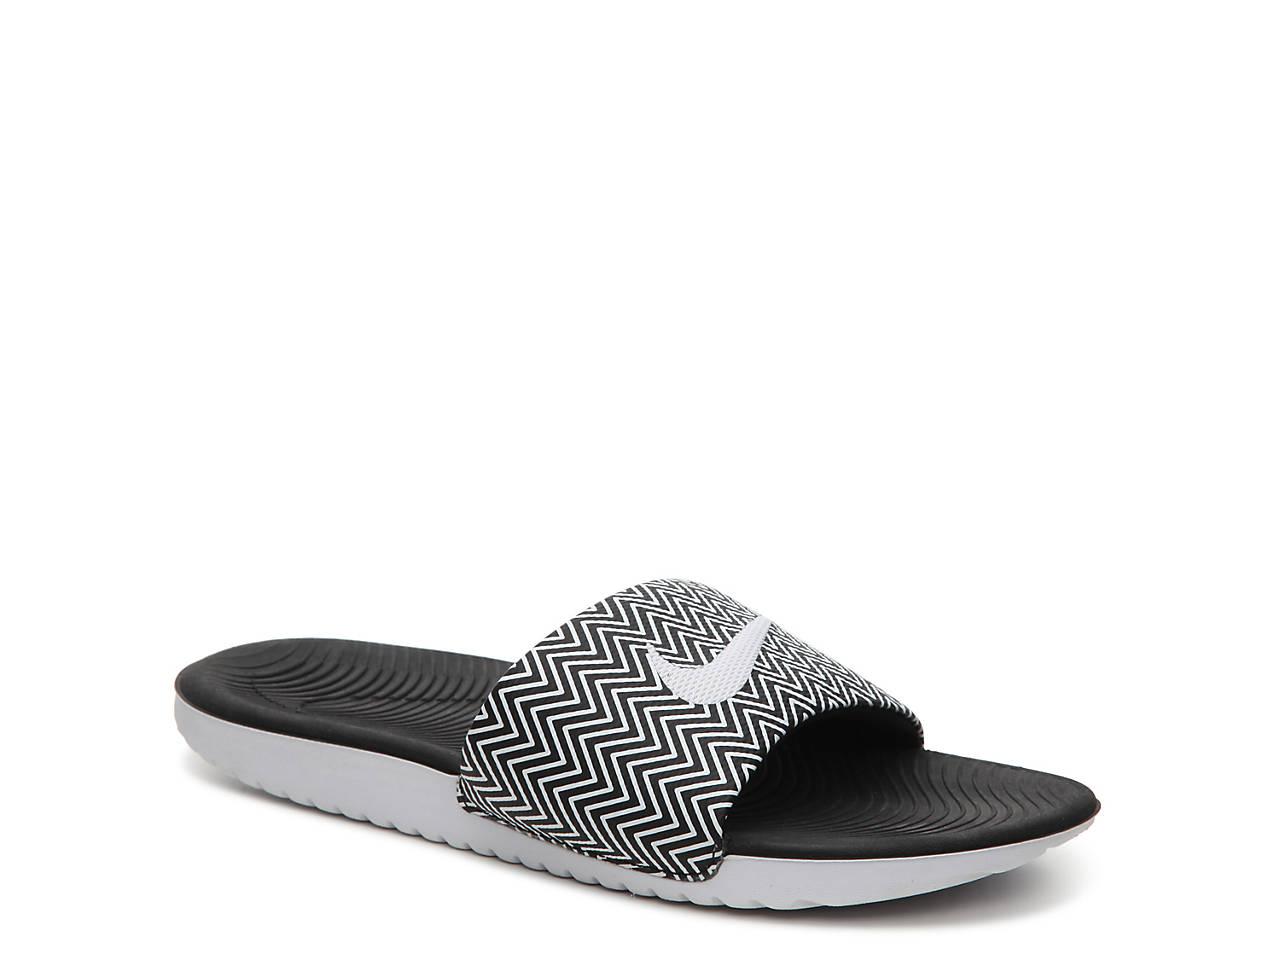 effab91f296592 Nike Kawa Print Slide Sandal - Women s Women s Shoes